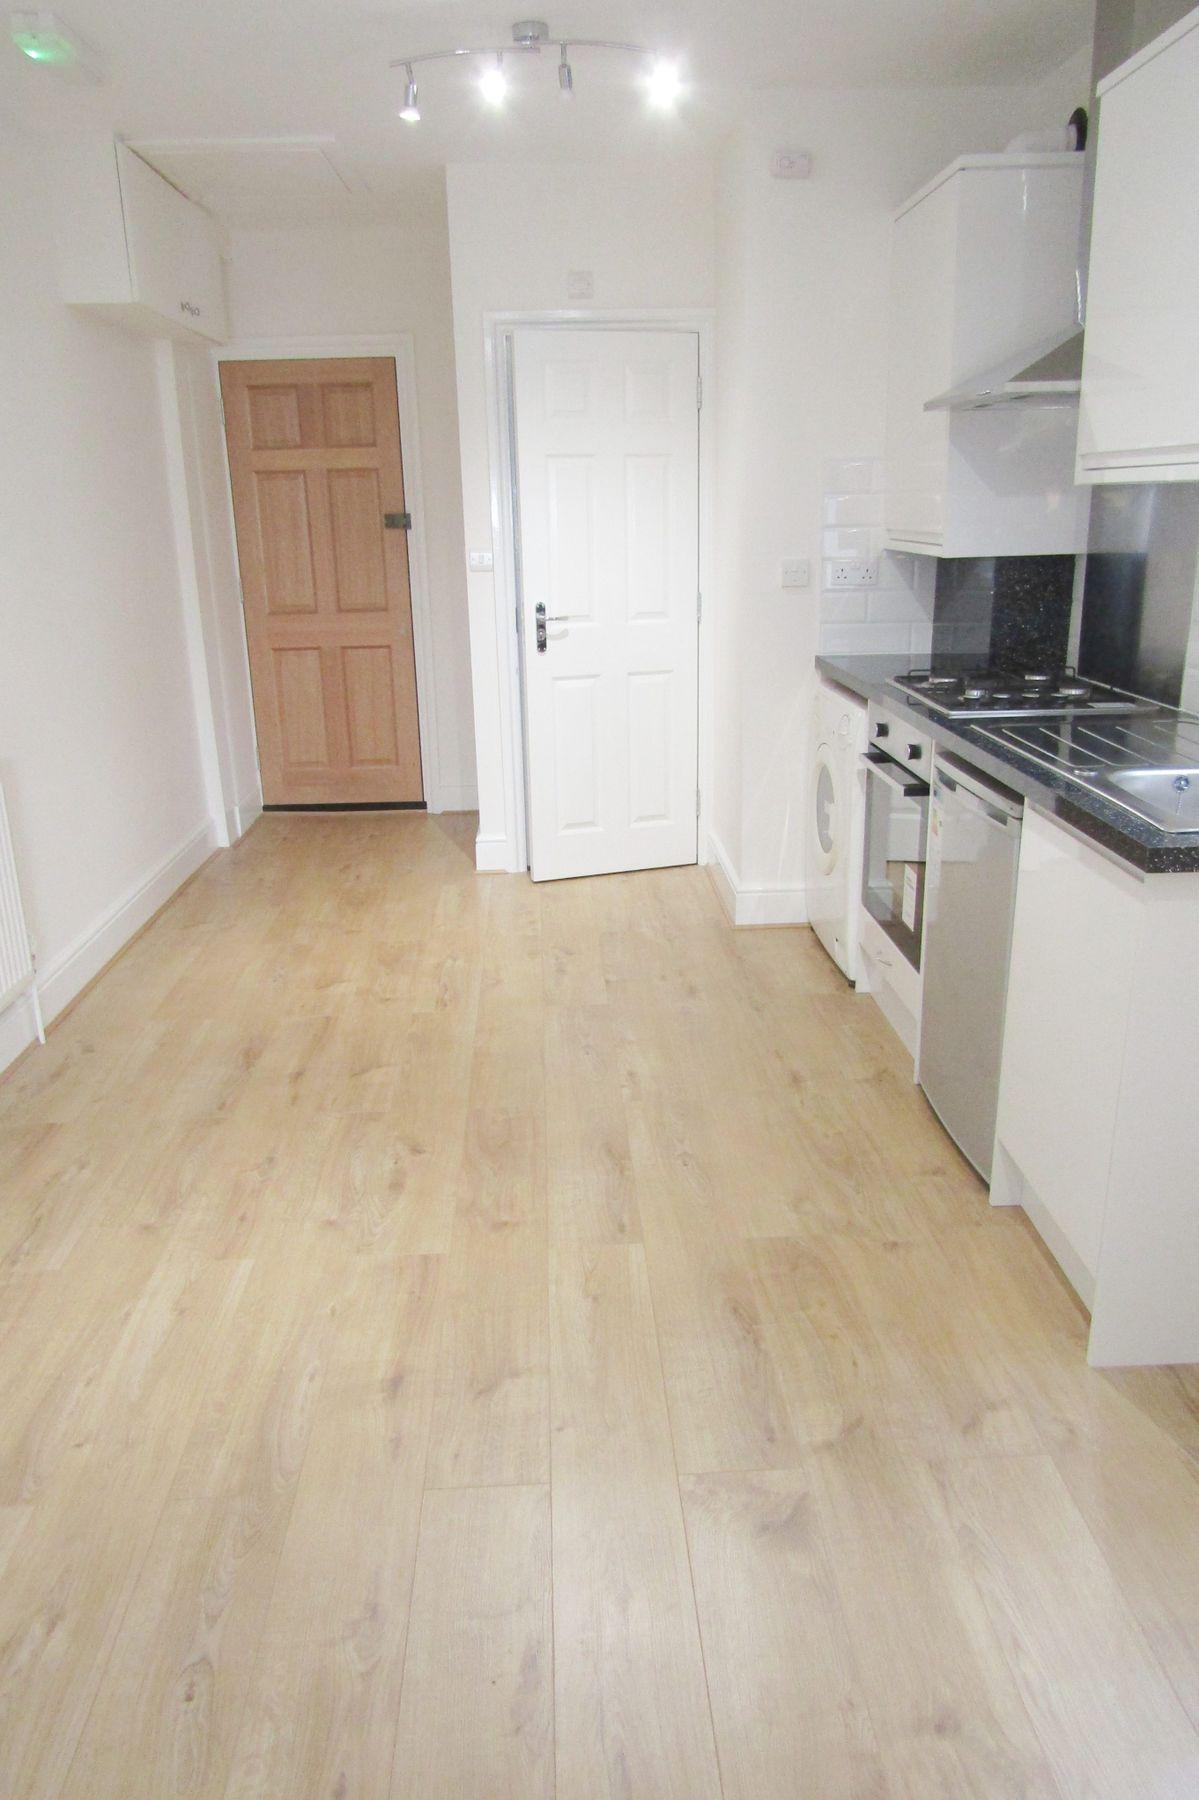 Property photo 1 of 5. Open Plan Living Room/Bedroom/Kitchen